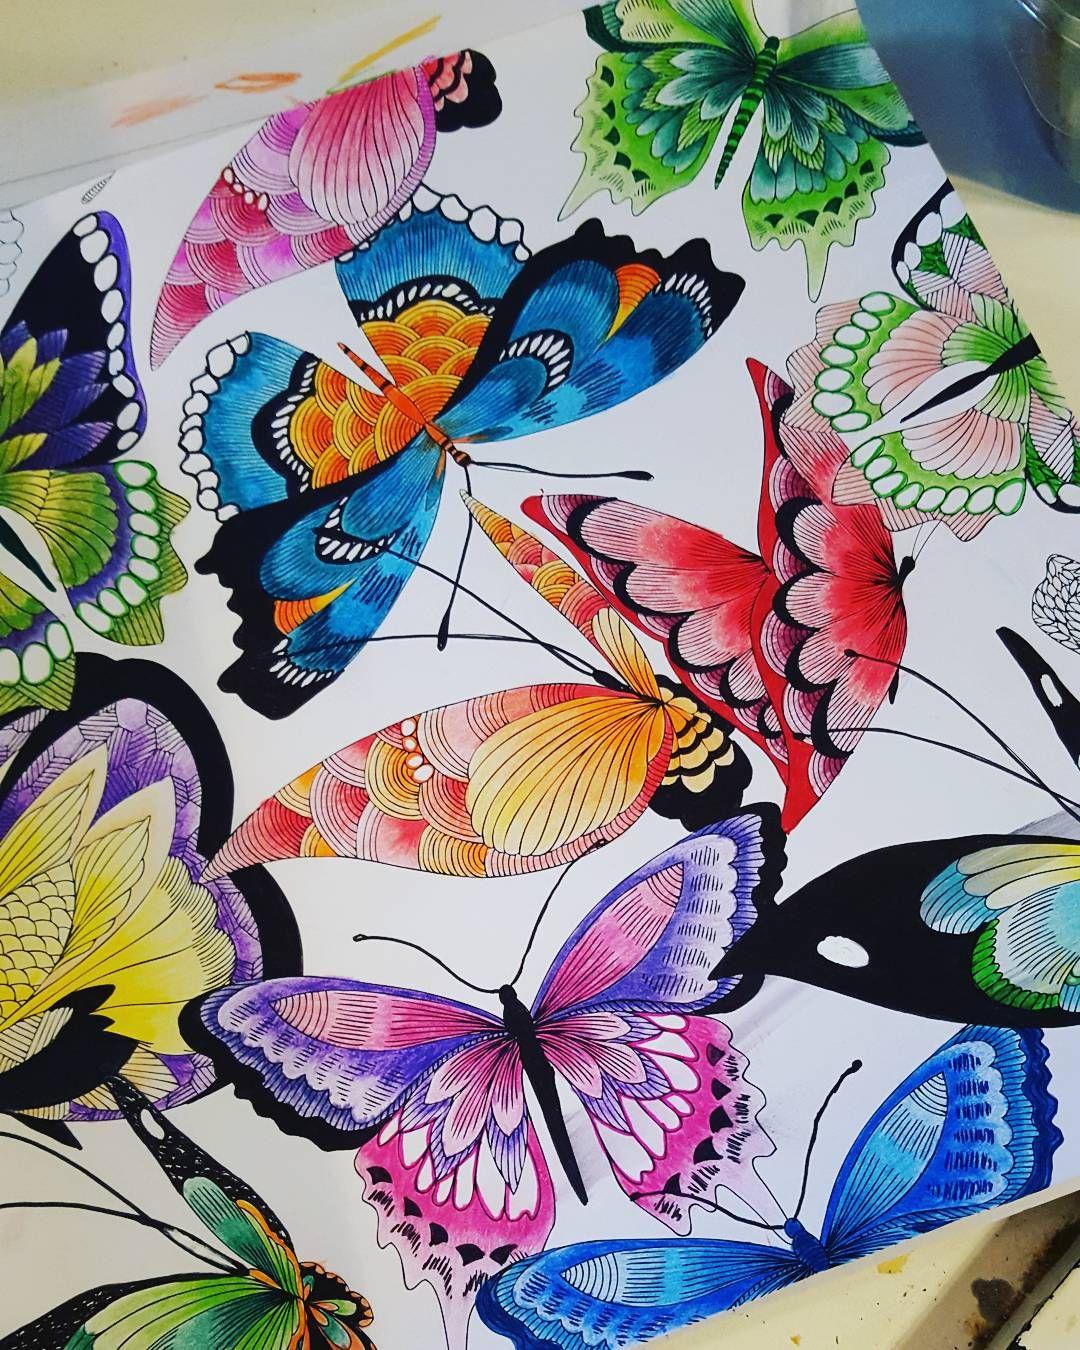 "jessicabinczyk on Instagram: ""Finished my butterflies"